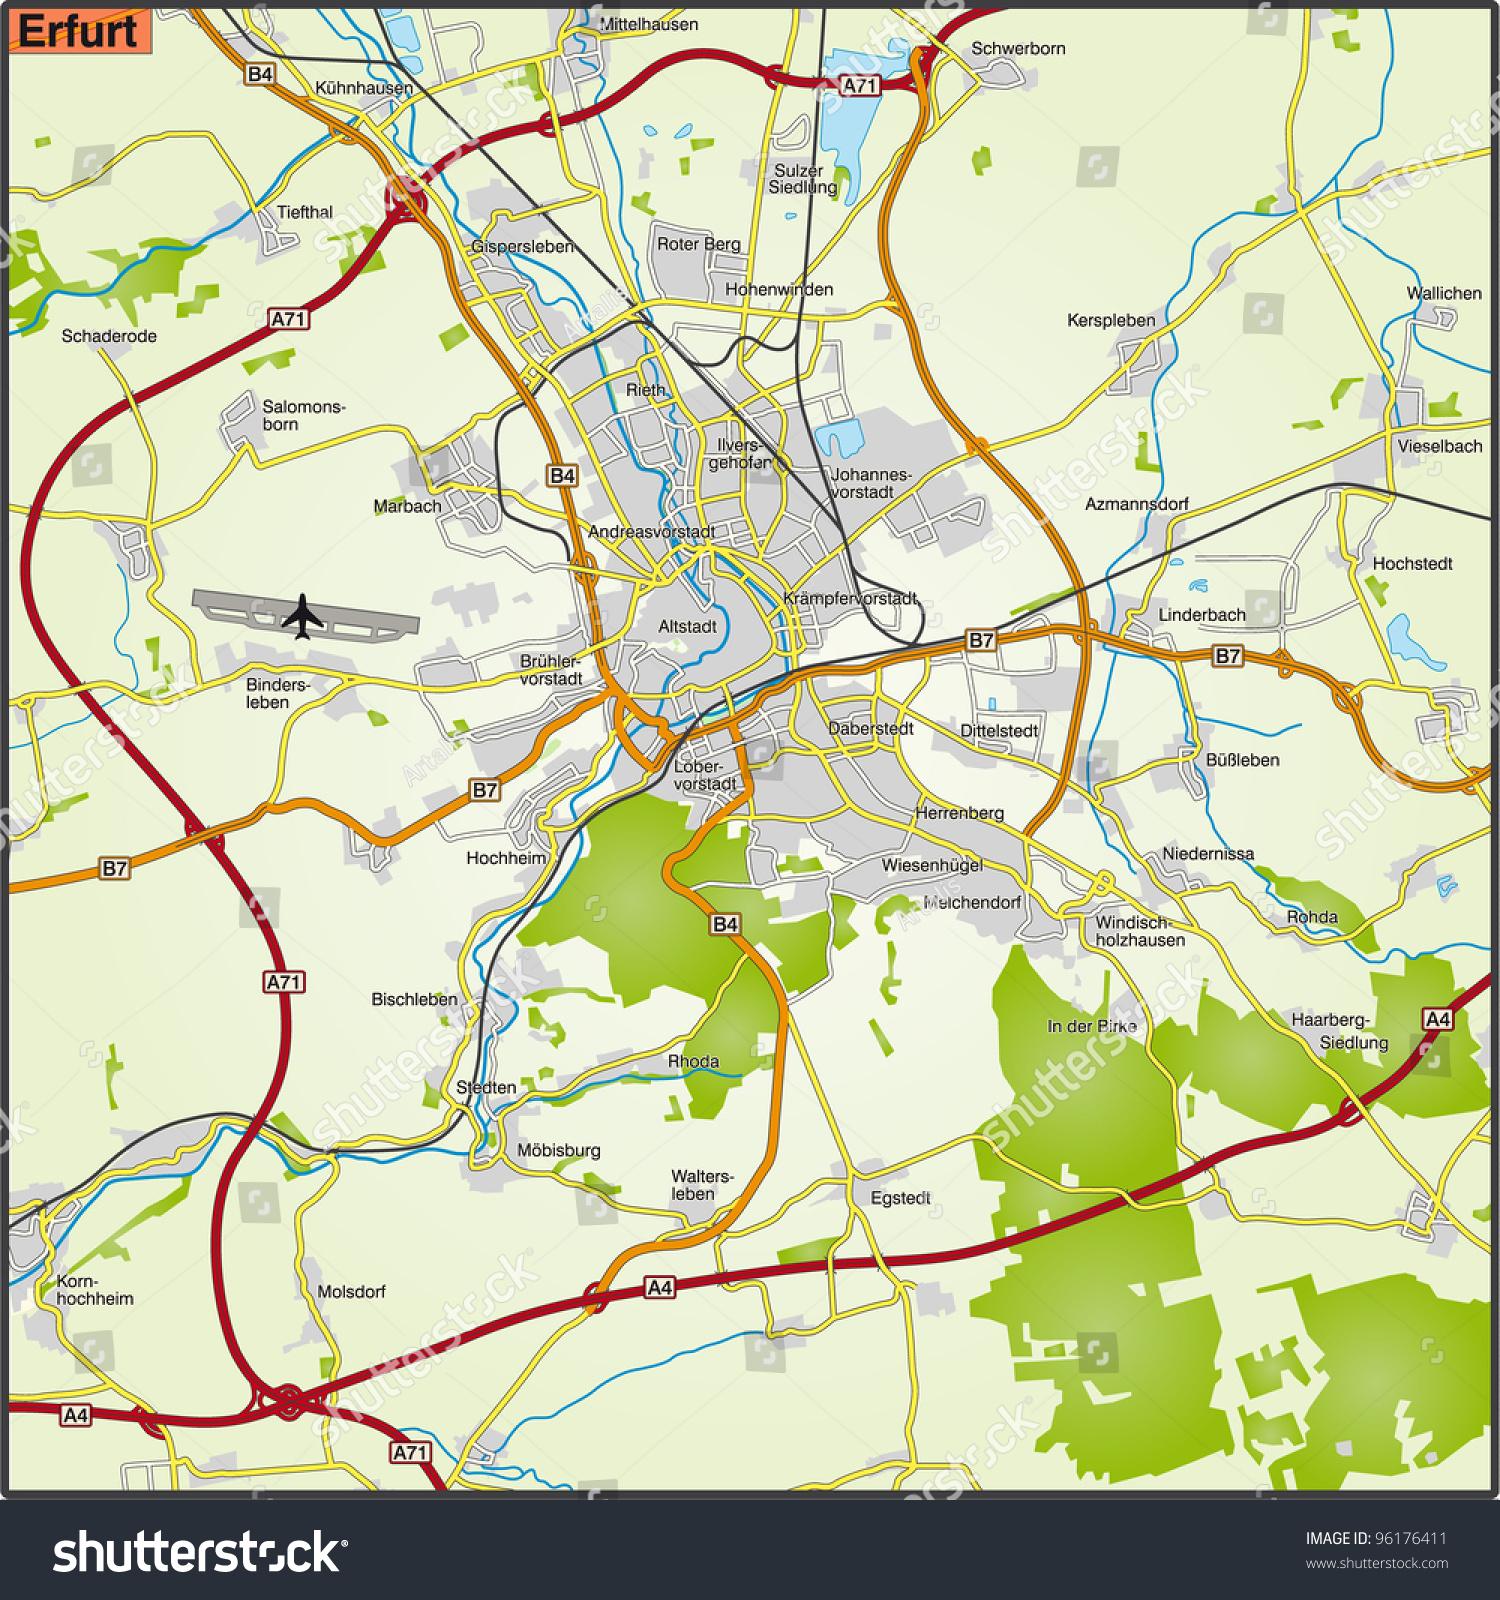 Map Erfurt State Capital Thuringia Stock Illustration 96176411